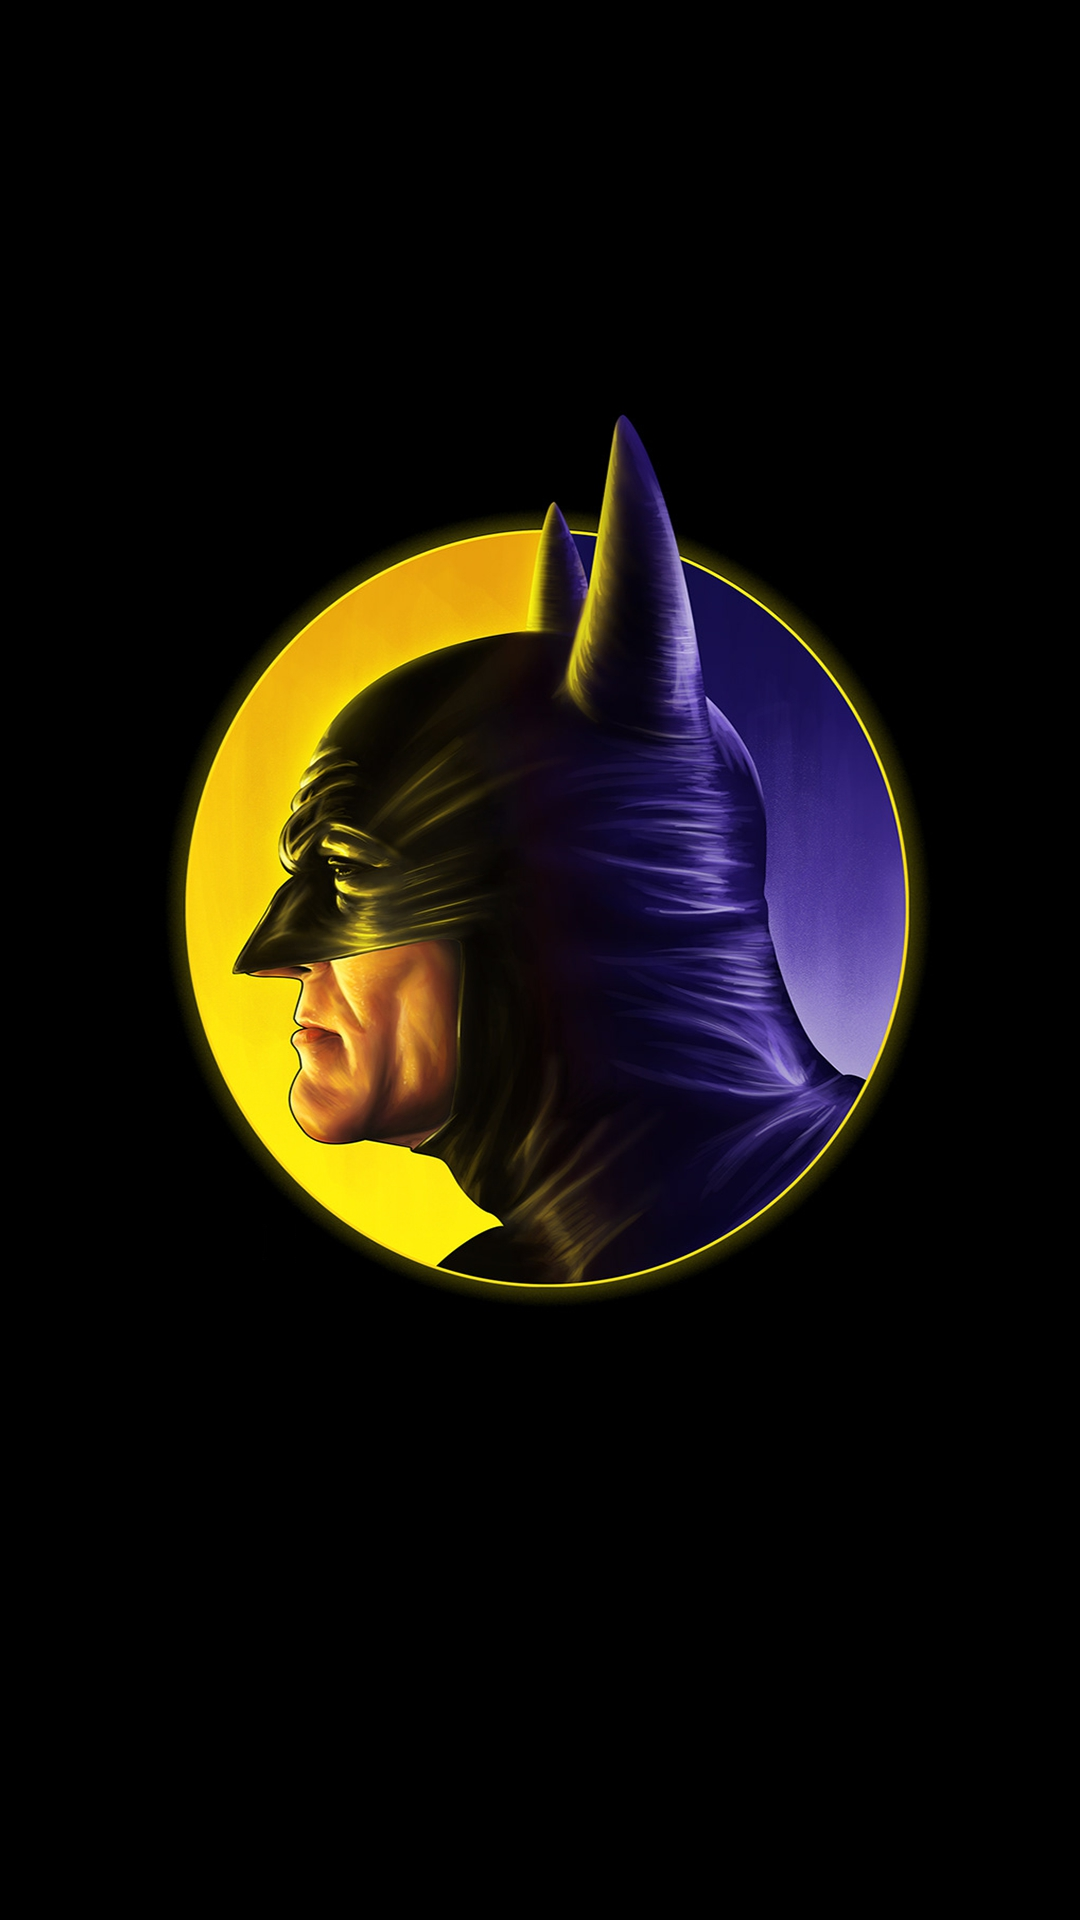 The Batman Dark Minimal iPhone Wallpaper